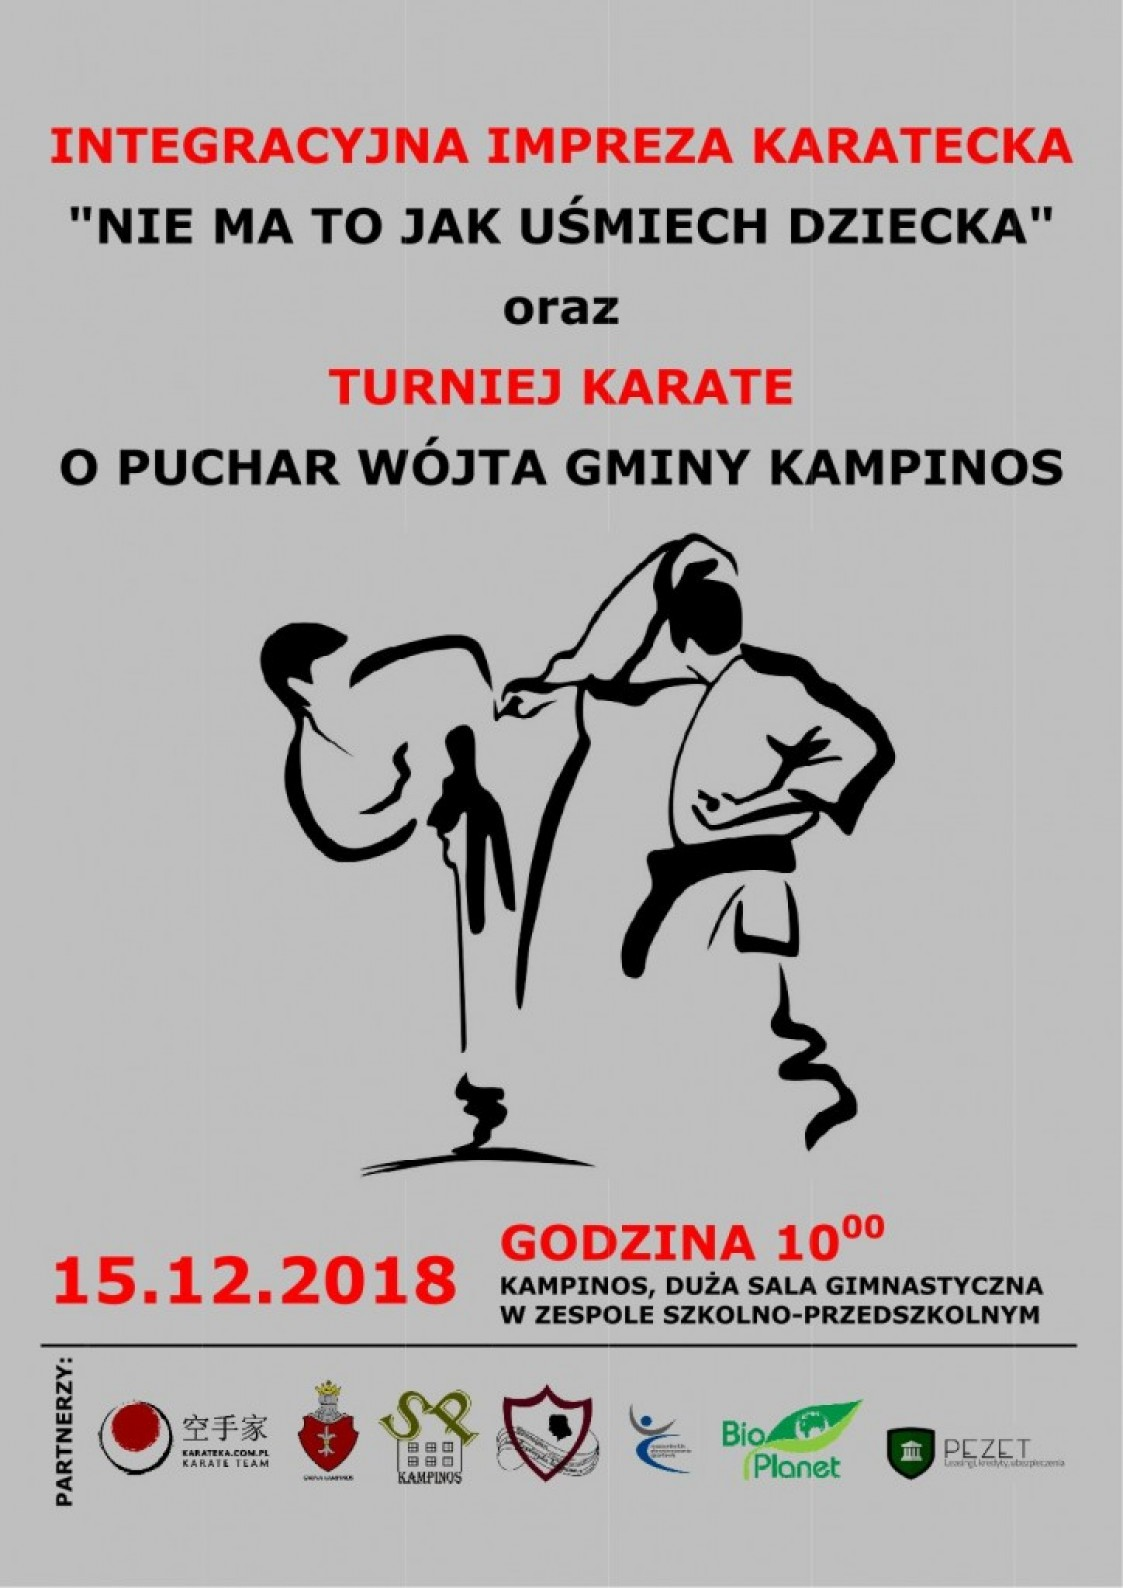 Integracyjna Impreza Karatecka